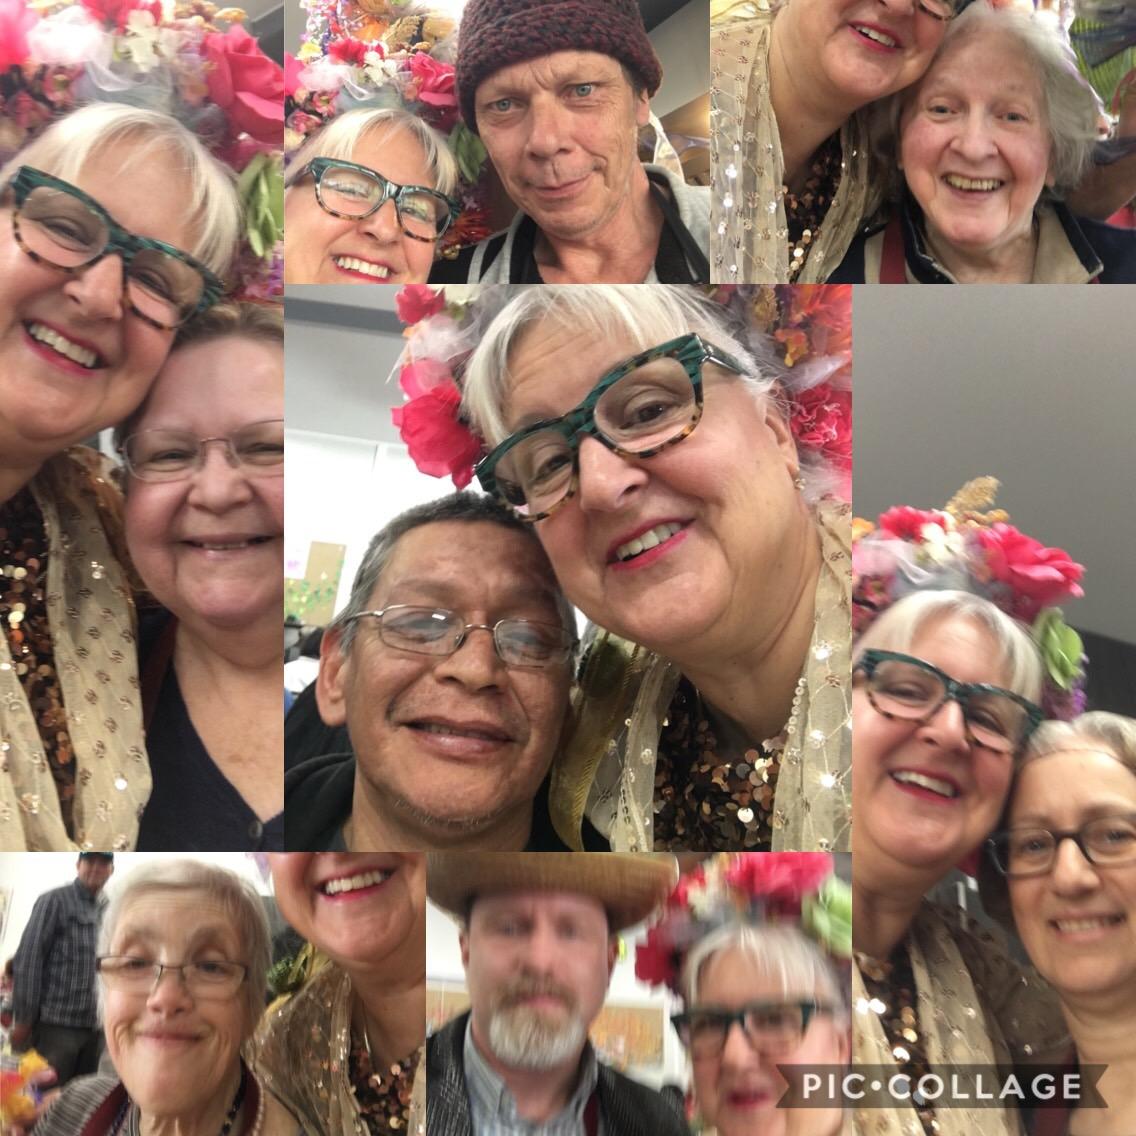 A collage of photos of MC